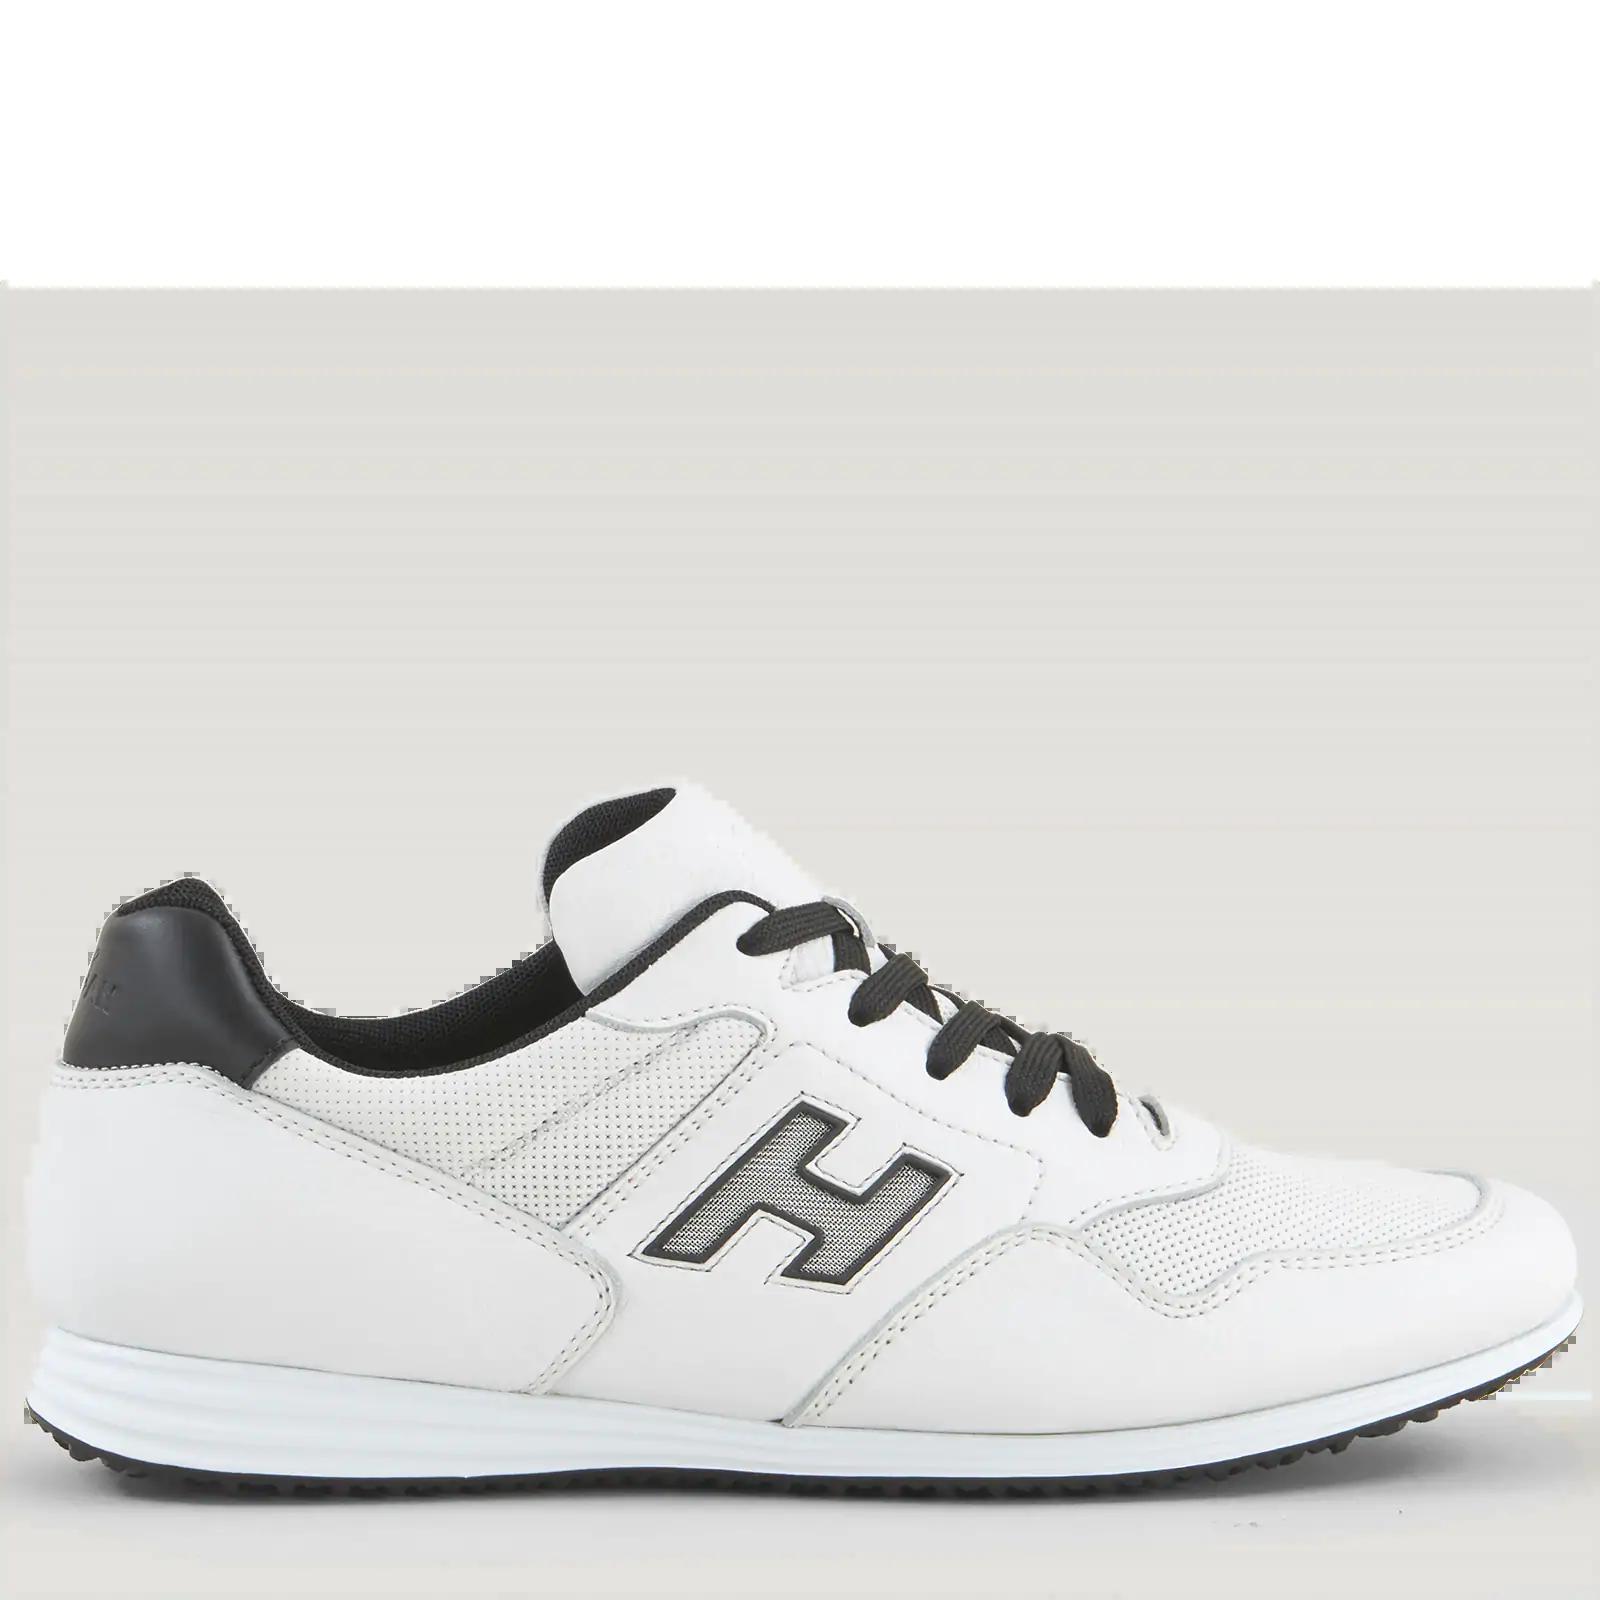 Hogan - Olympia X - H205 In Schwarz,silber,weiss | ModeSens